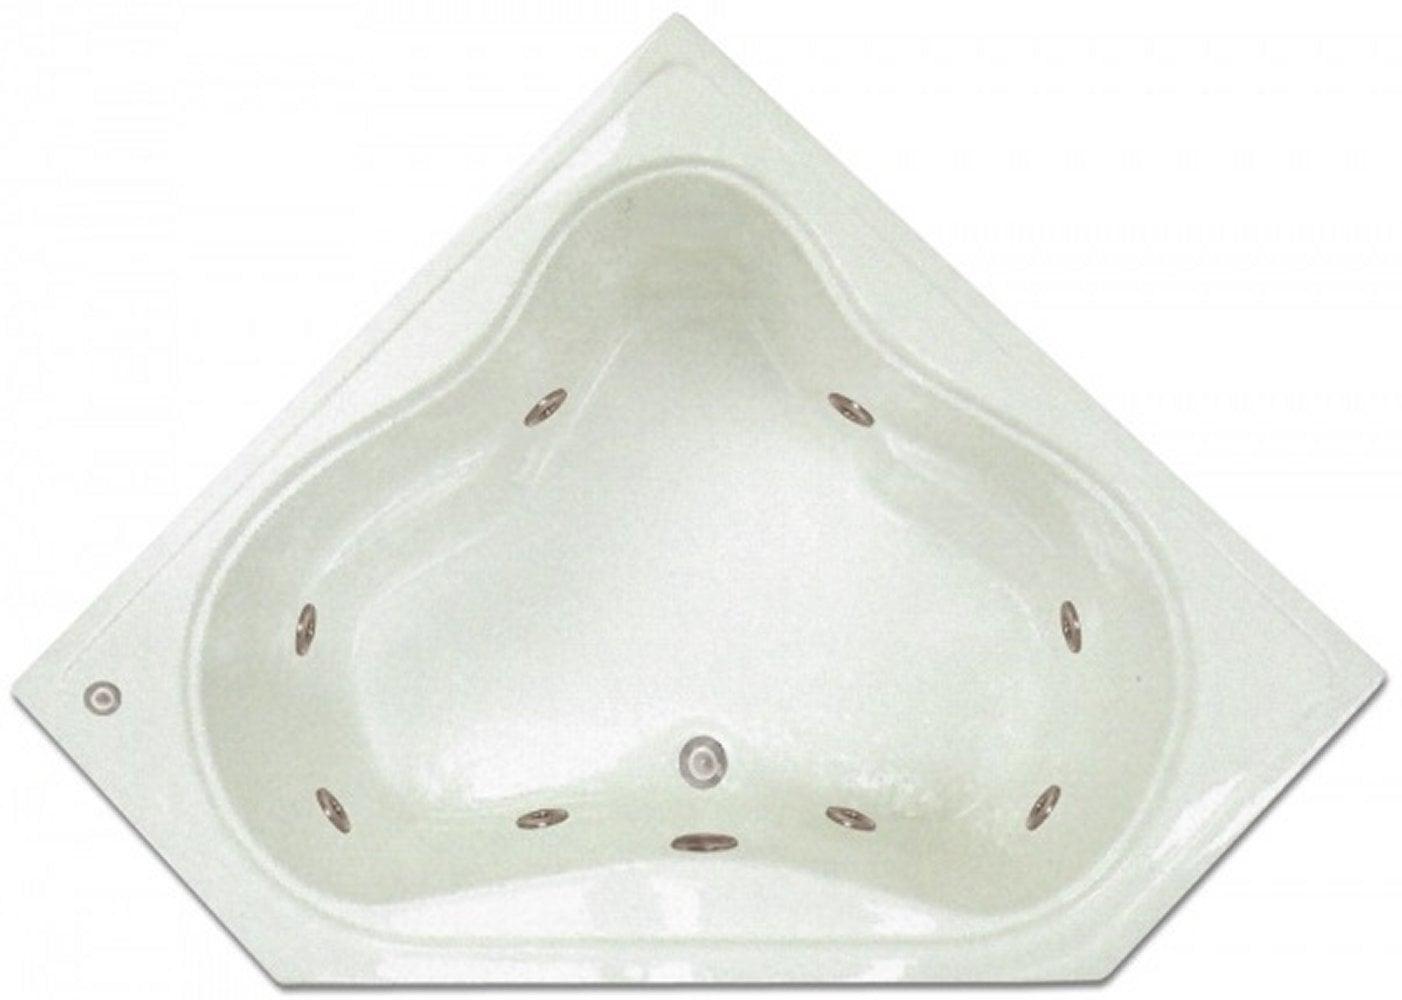 Drop-in Bathtub / 53.75x22.75x17.5 / high gloss white acrylic / Corner / LPI303-W Pinnacle Bath - Whirlpool 0